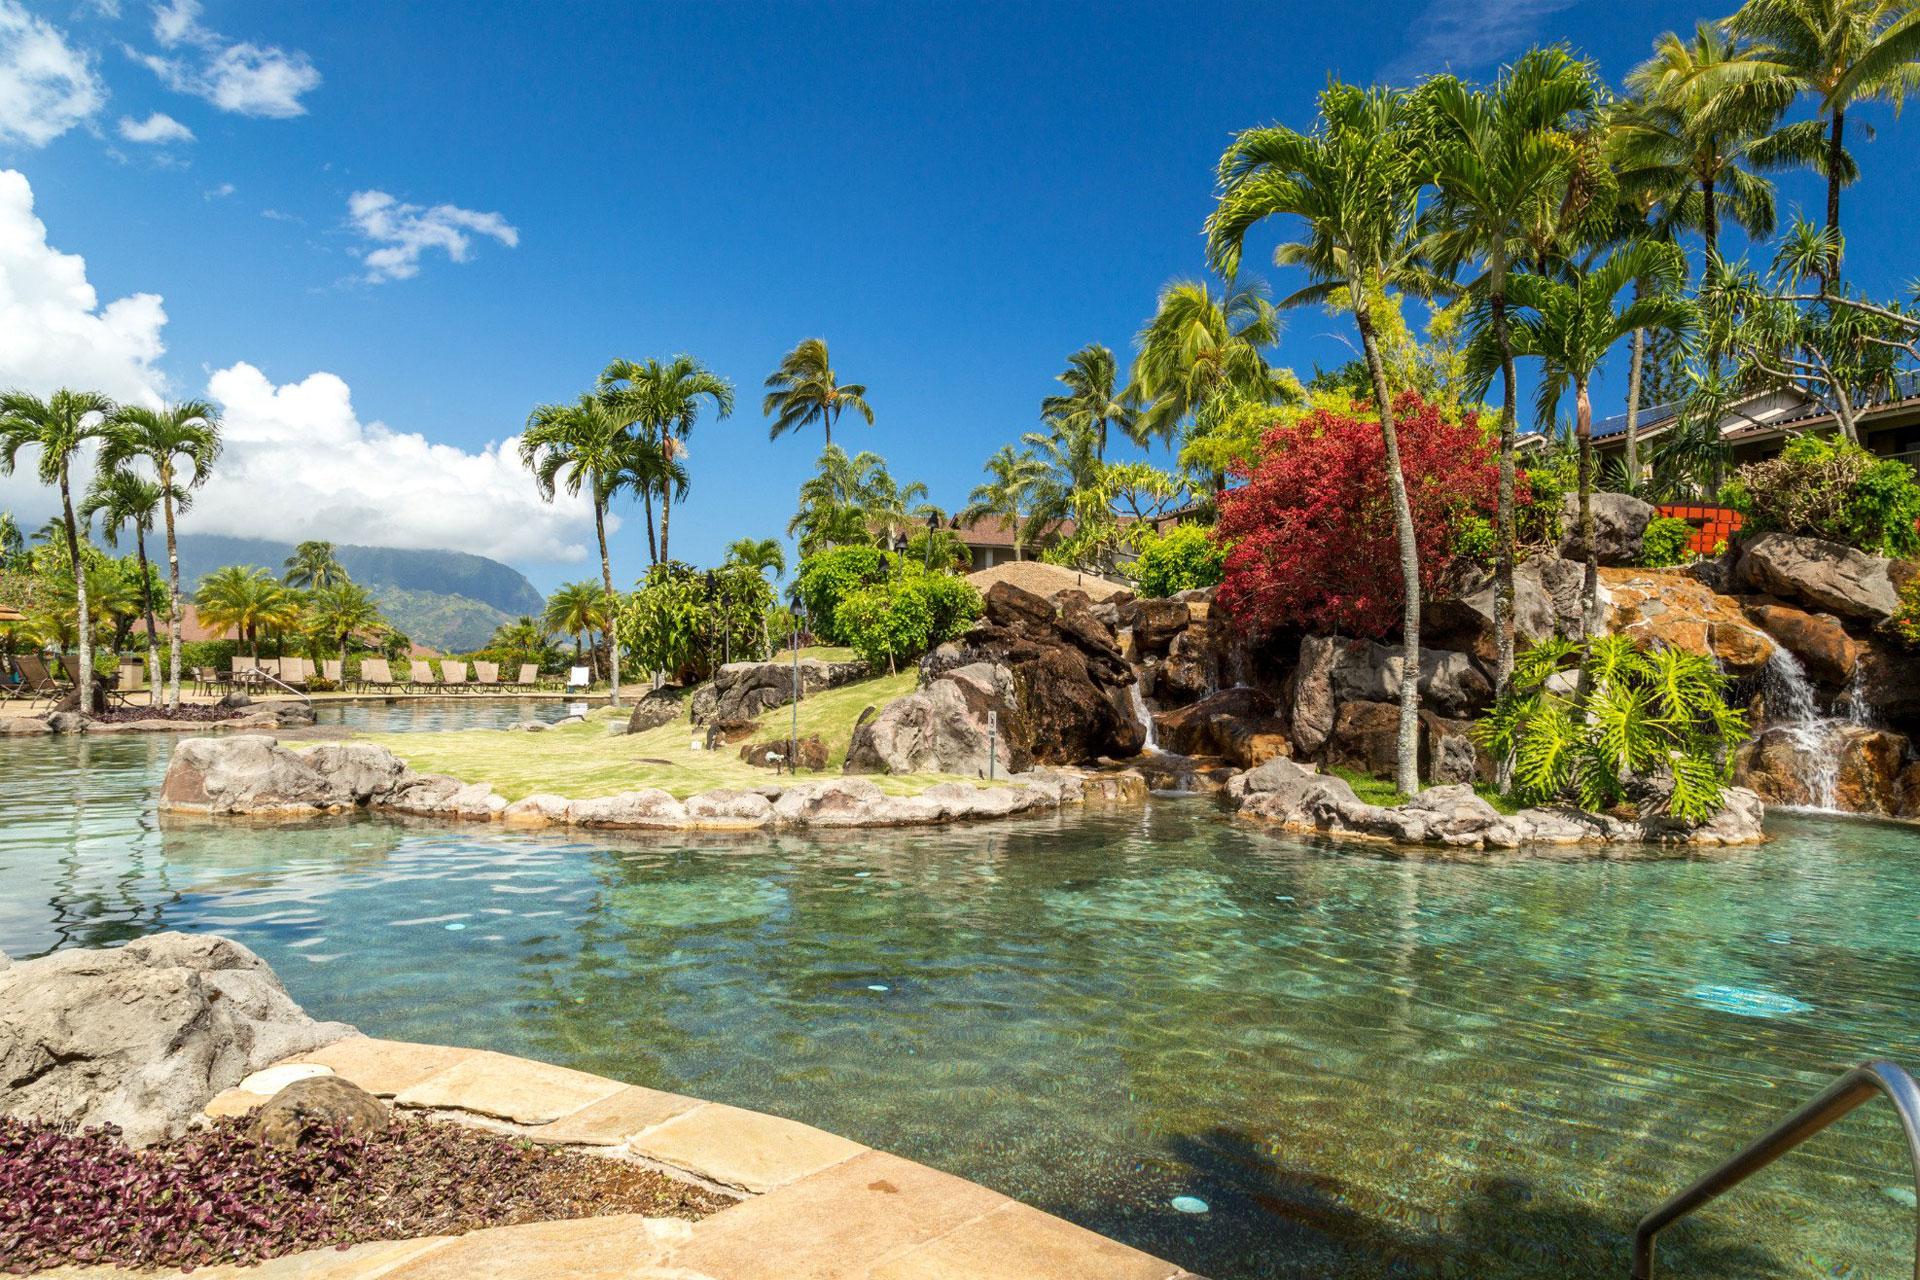 Pool at Hanalei Bay Resort; Courtesy of Hanalei Bay Resort